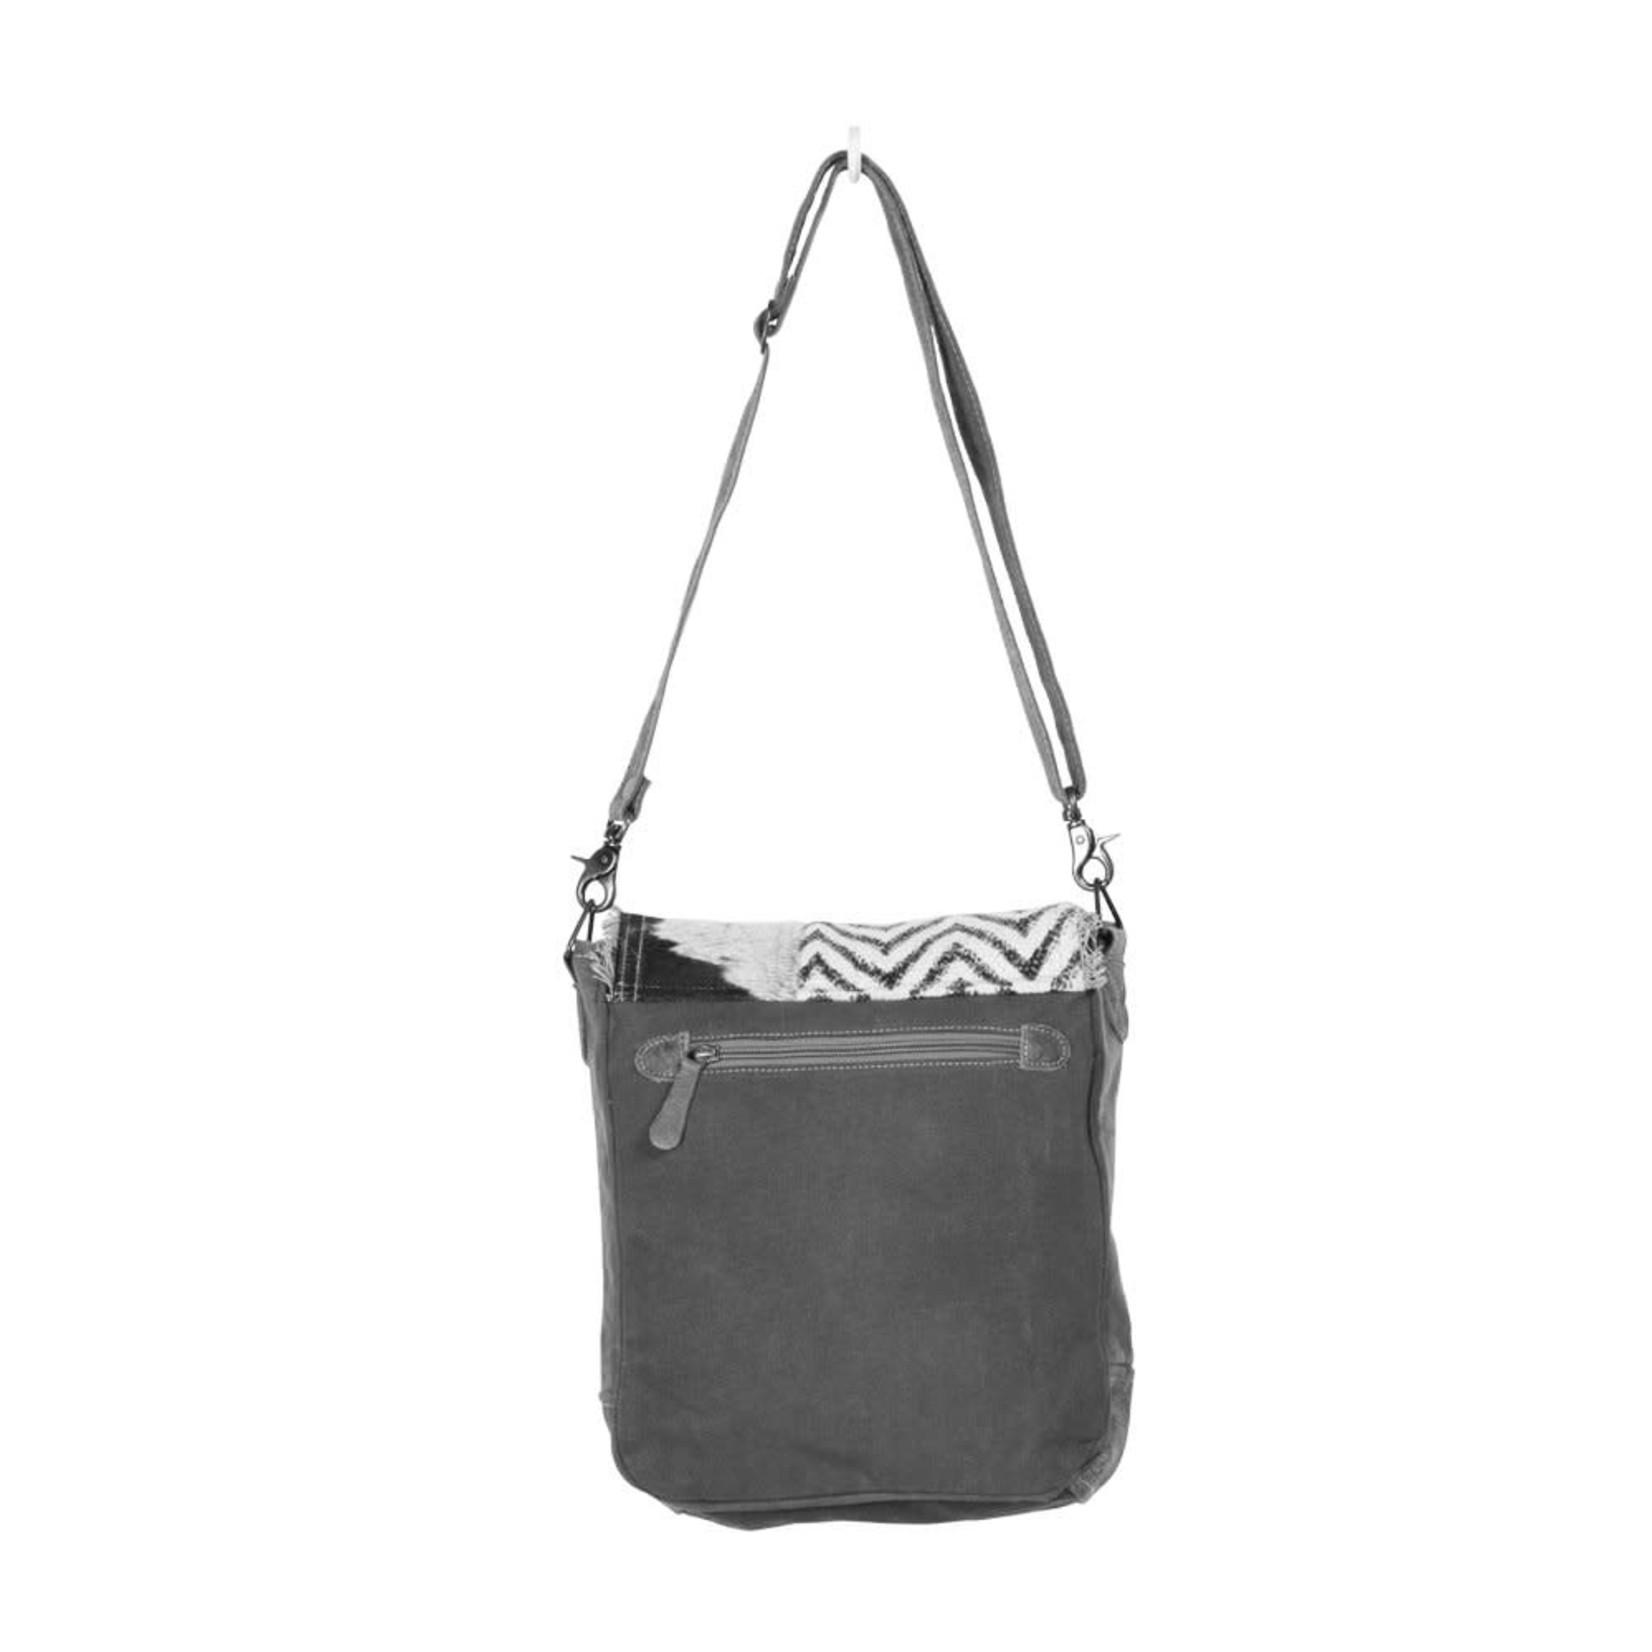 Myra Bags S-1370 Rug & Patches Design Shoulder Bag